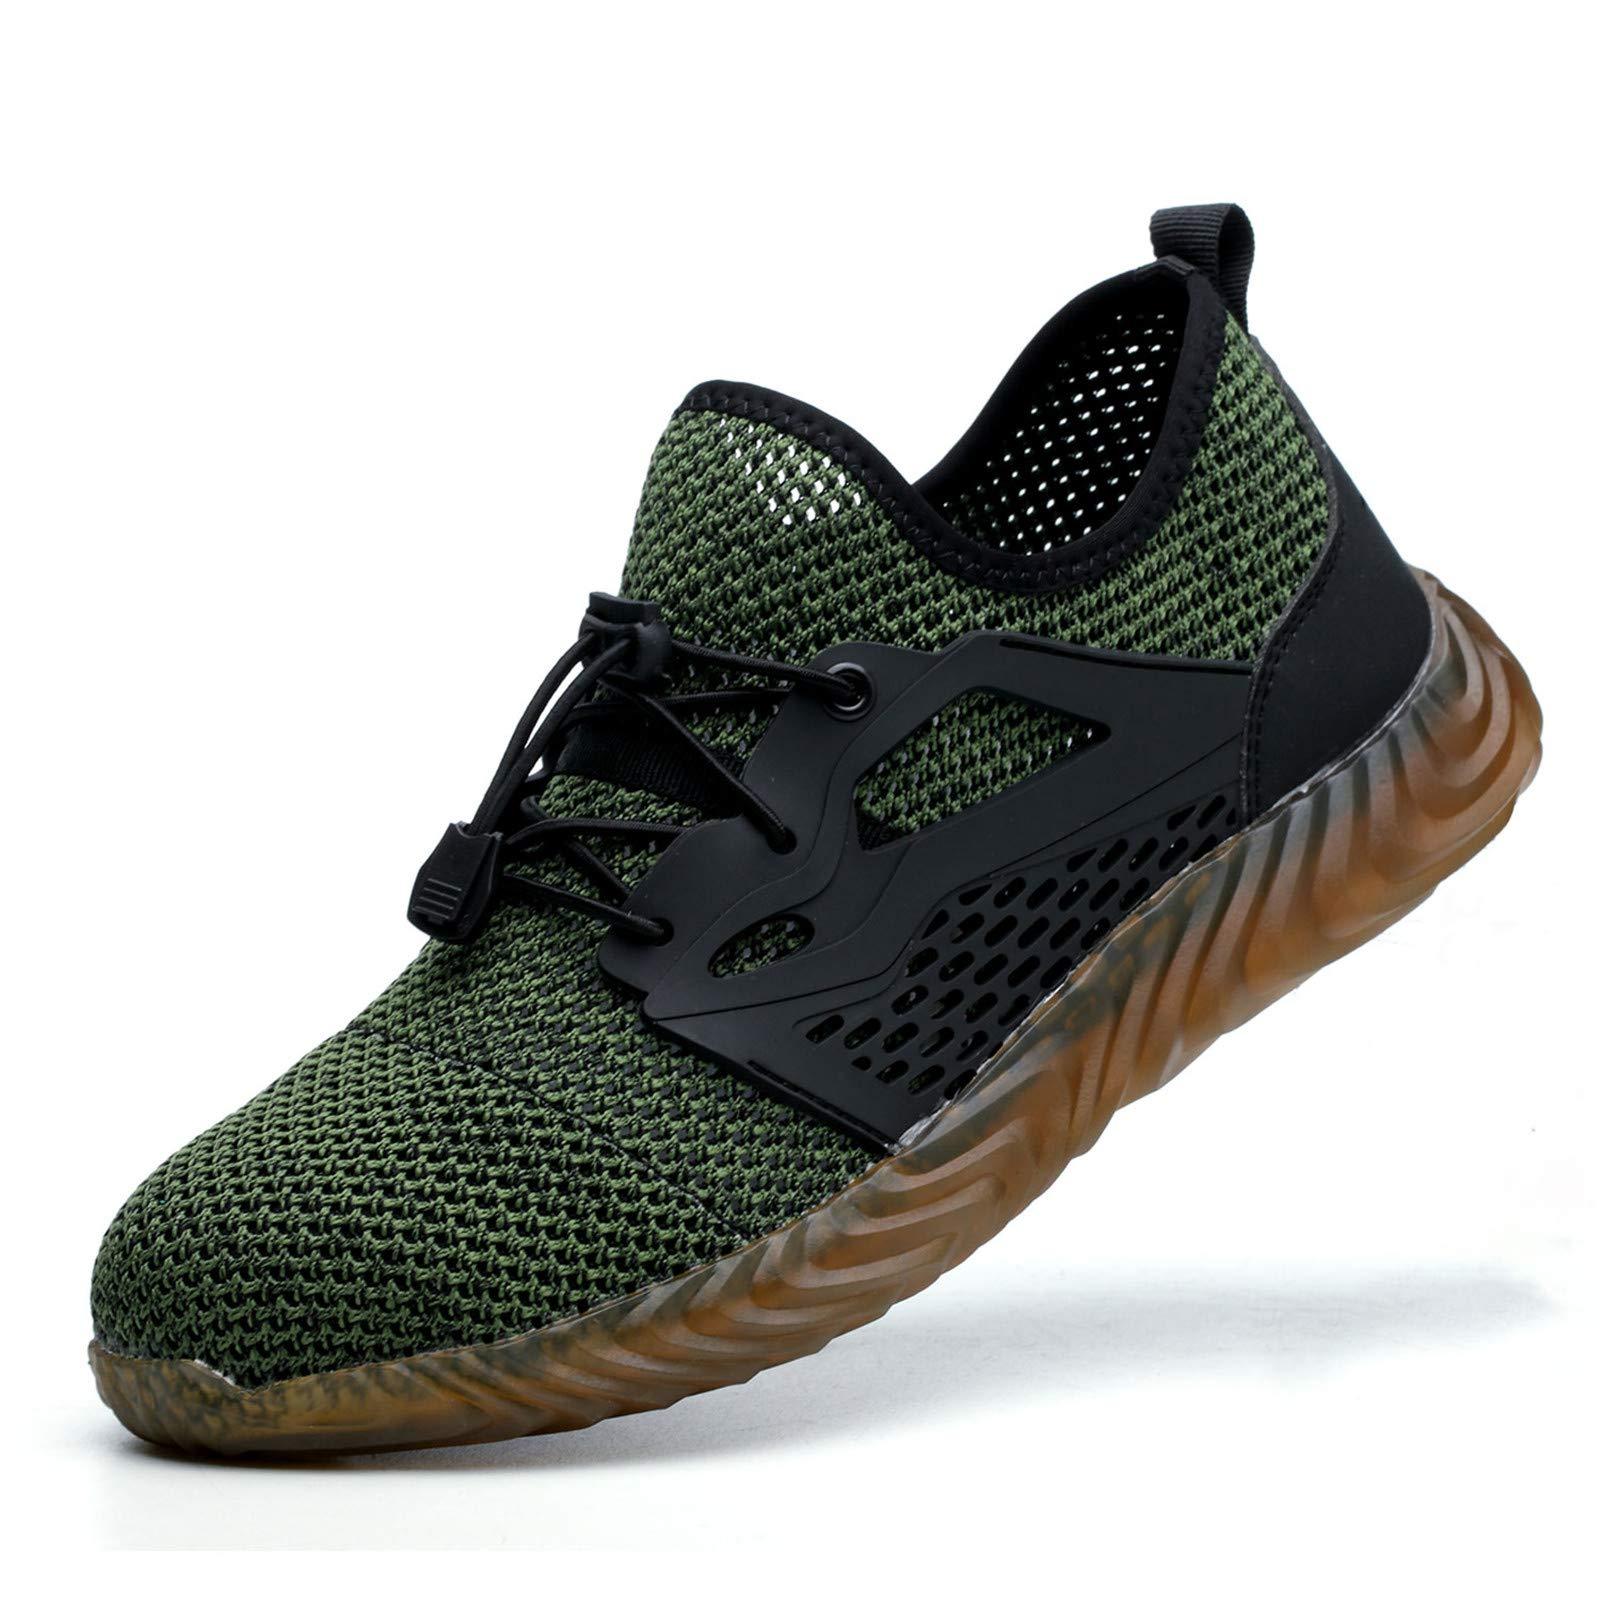 JACKSHIBO Steel Toe Shoes Men, Indestructible Work Safety Shoes Lightweight, Slip Resistant Breathable, Industrial ConstructionShoes